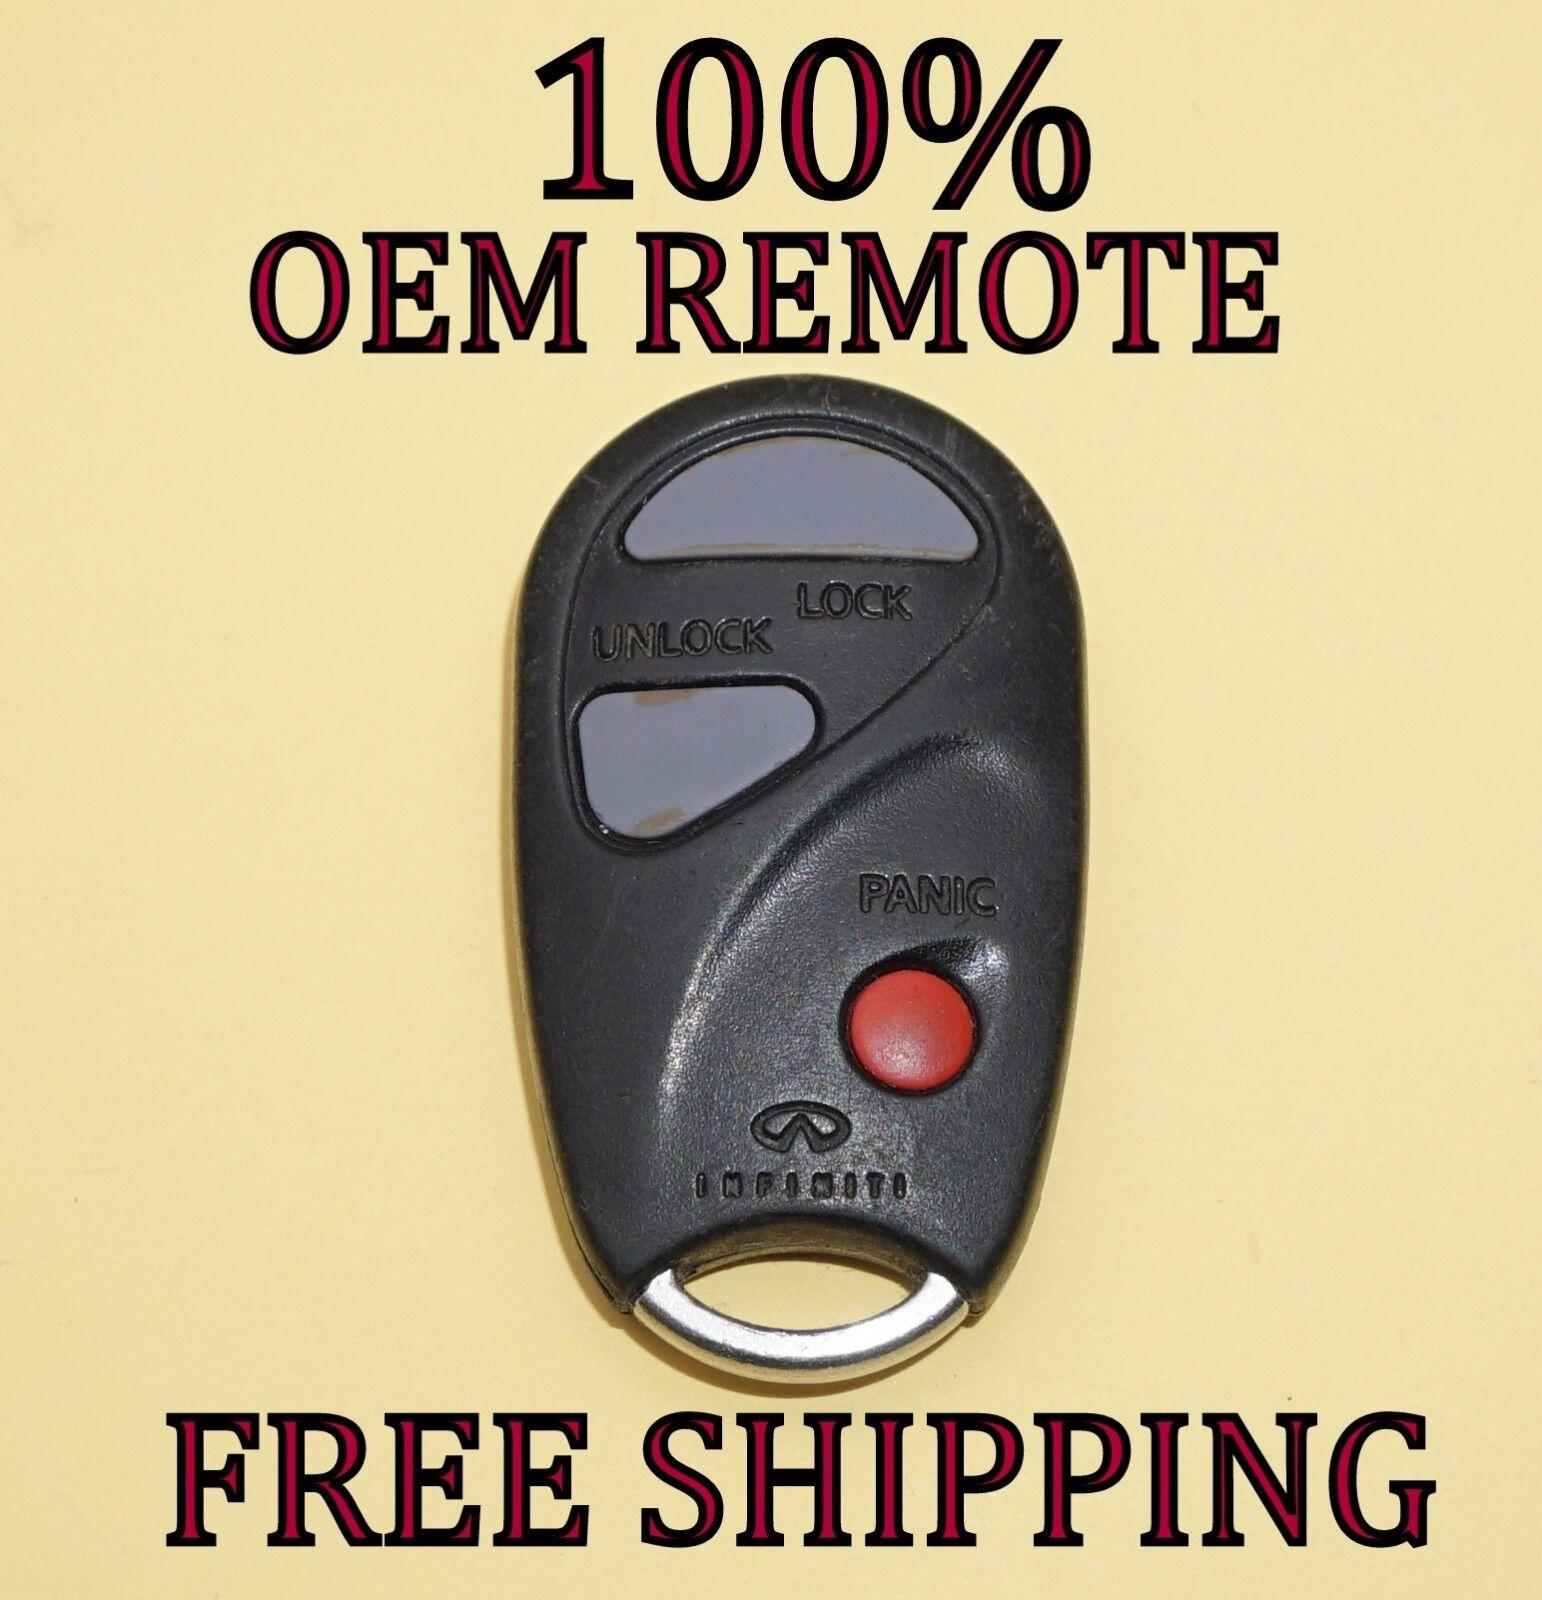 Buy Used Keyless Entry Remotes Fobs Page 75 Remote For Infiniti Q45 Starter 100 Oem 1999 2000 Qx4 Fob Transmitter Kbrastu09